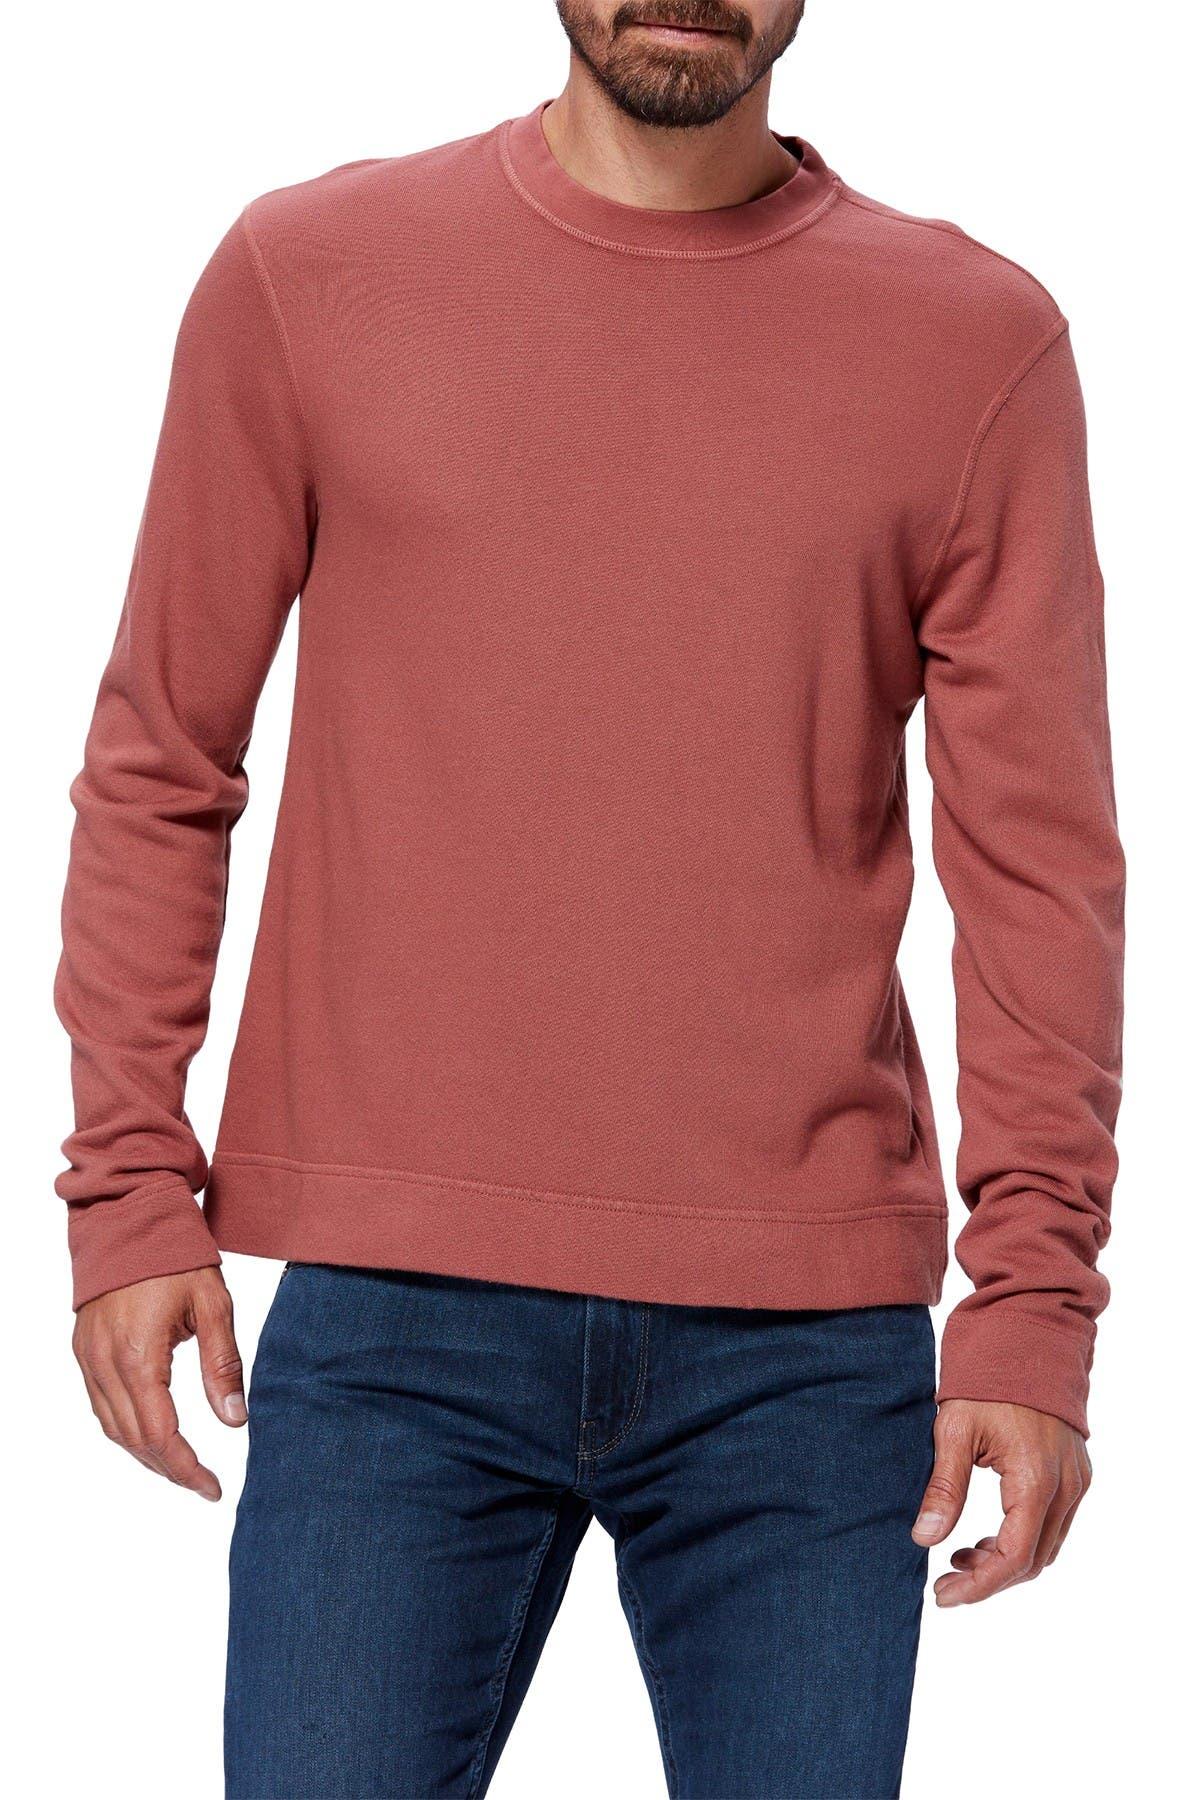 Image of PAIGE Marley Sweatshirt